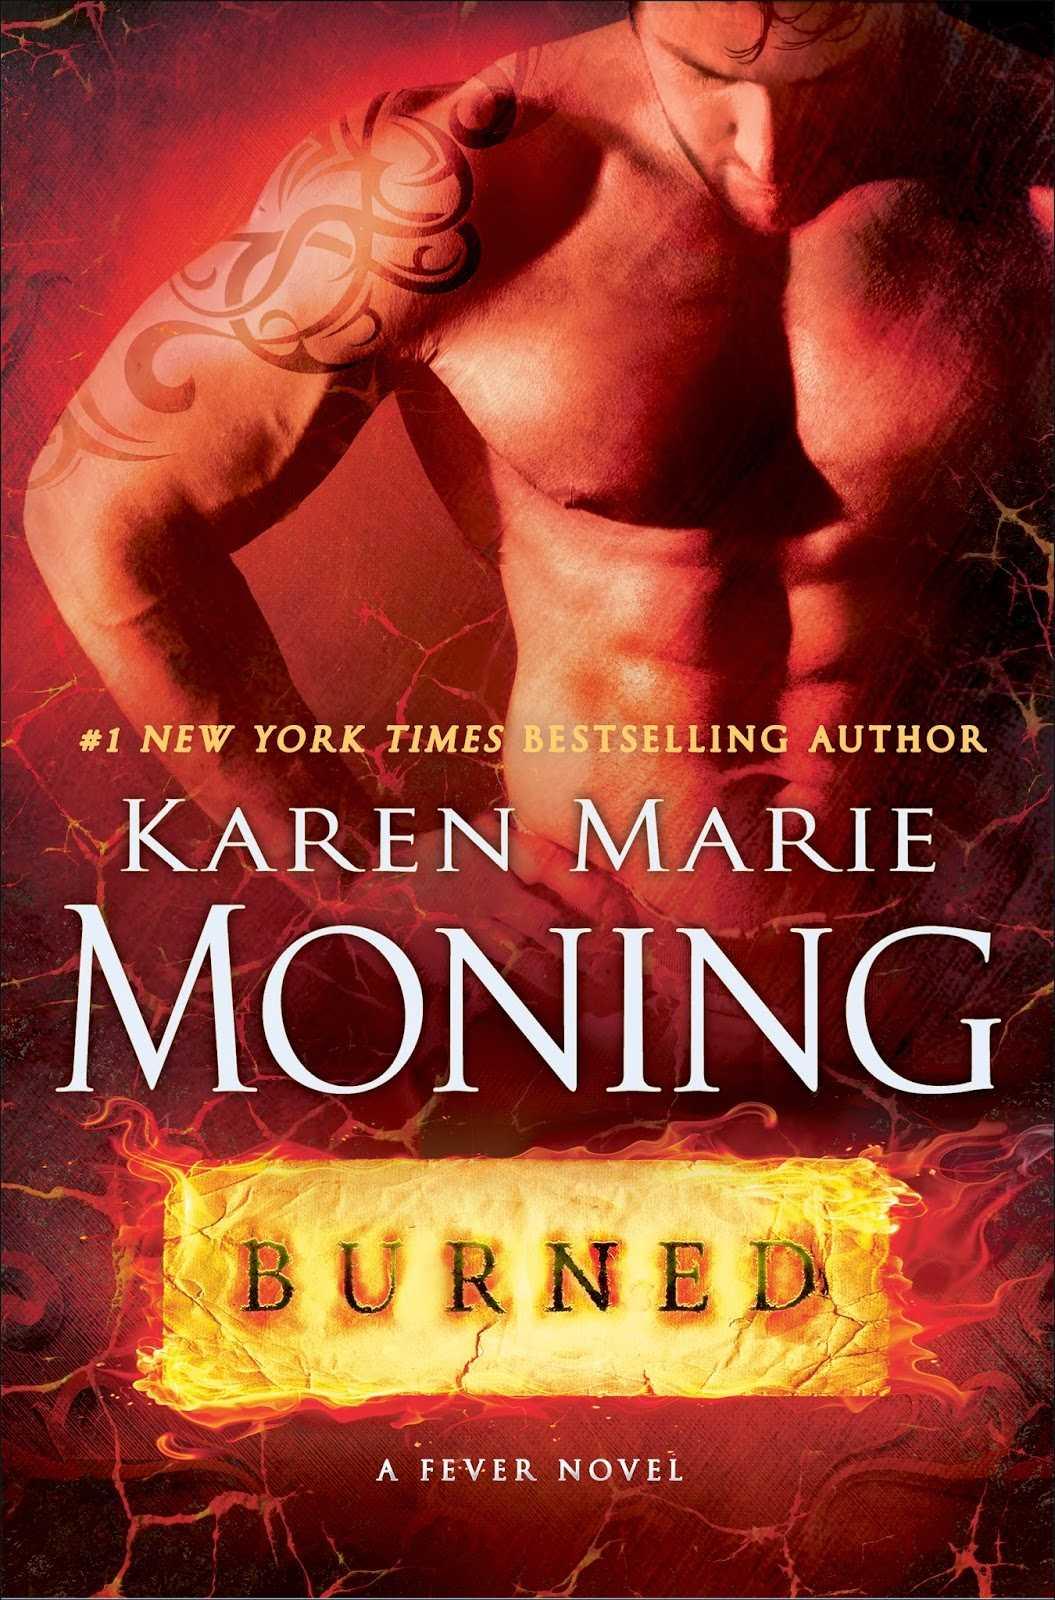 Karen Marie Moning Delivers Sensual, Action-Packed Fantasies In BURNED   BURNED